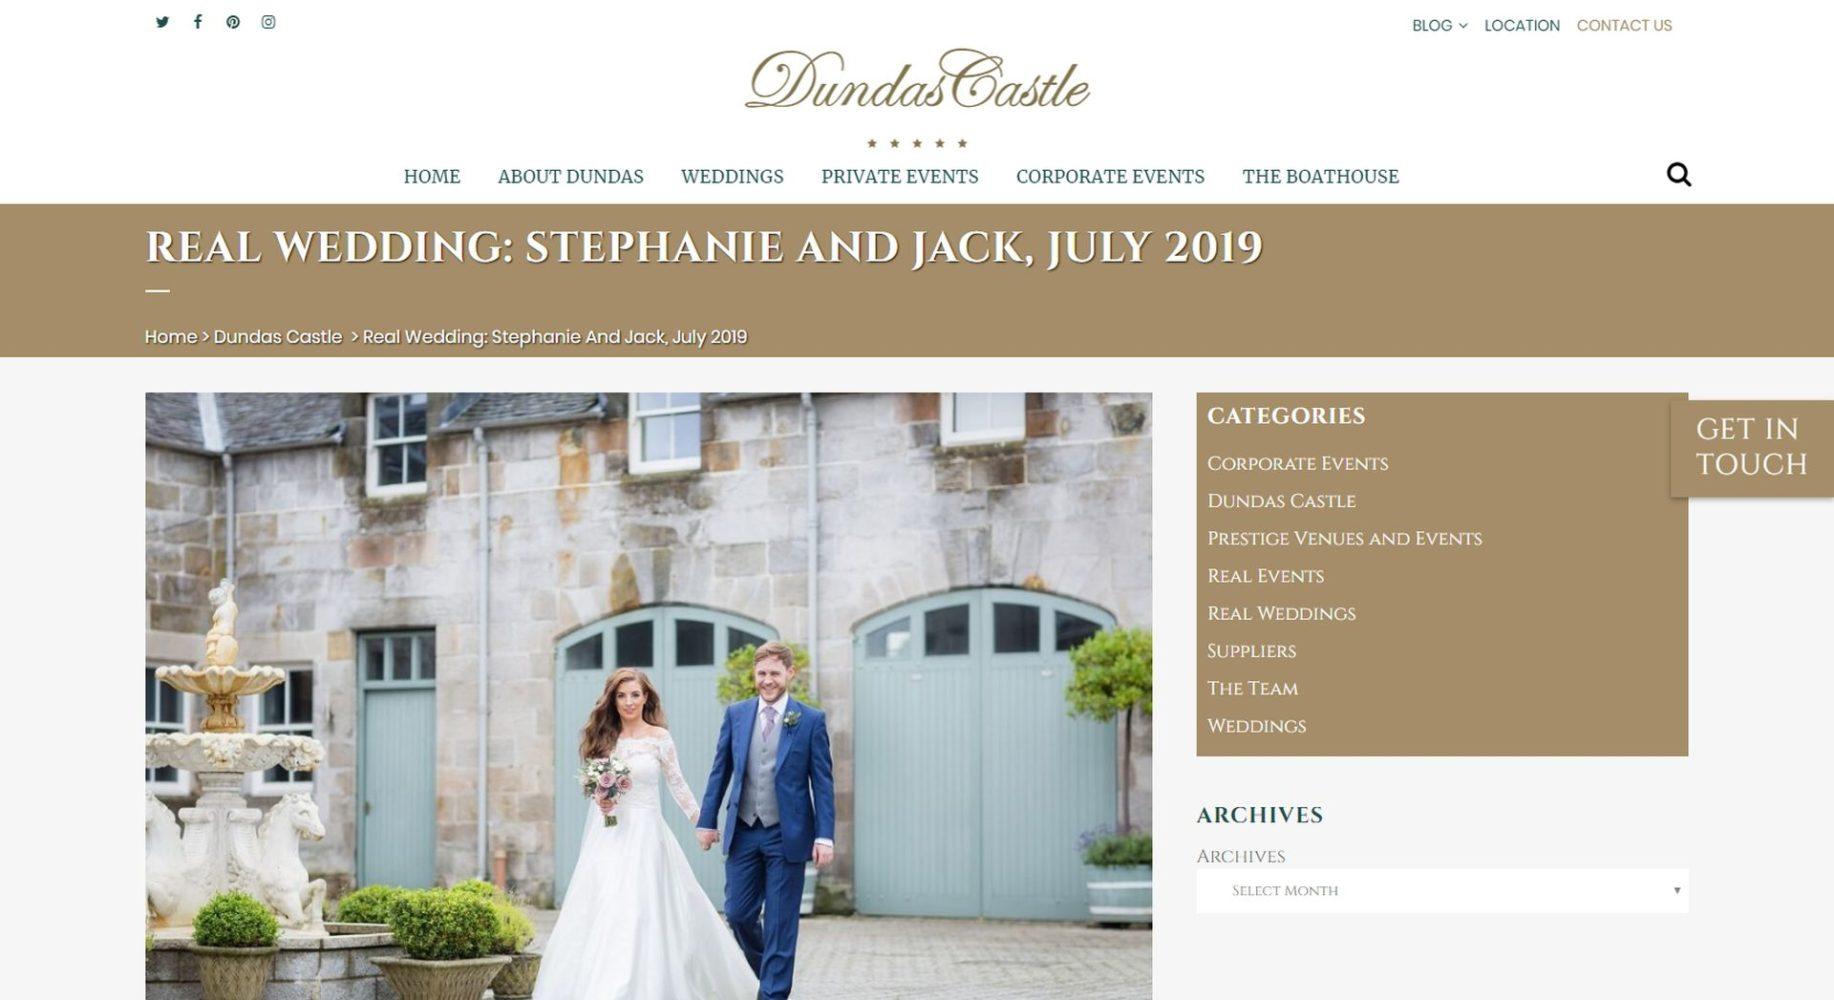 Dundas Castle Website Design Blog